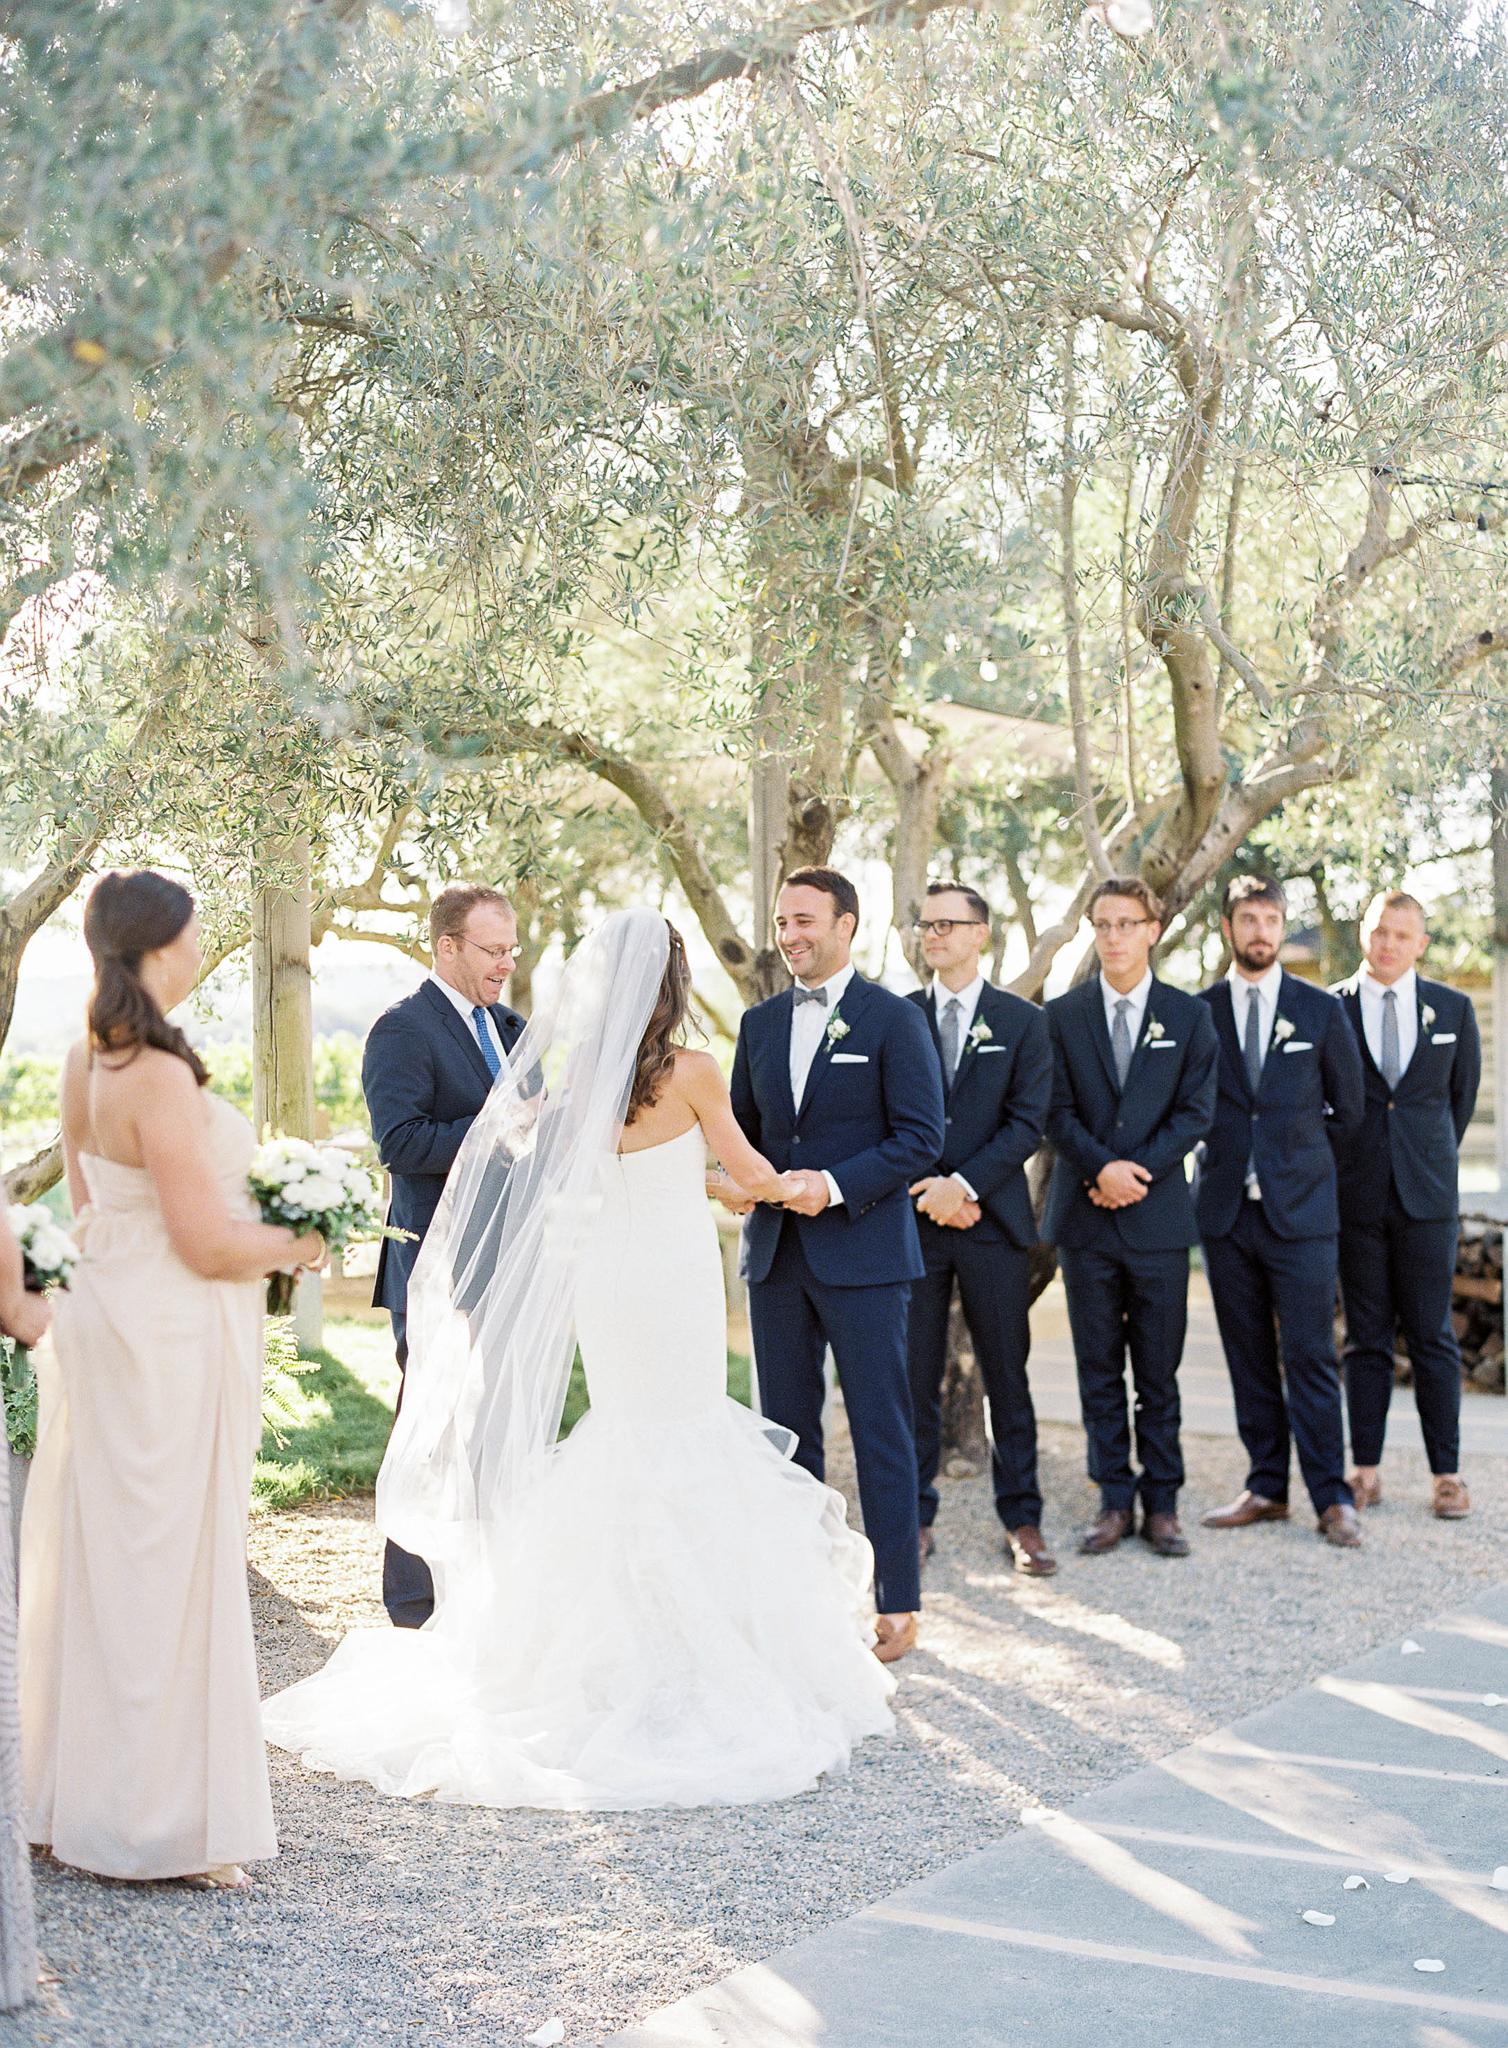 Meghan Mehan Photography - Fine Art Film Wedding Photography - San Francisco   Napa   Sonoma   Big Sur   Chicago   Minneapolis   Milwaukee   Lake Geneva   Door County   Wisconsin 020.jpg